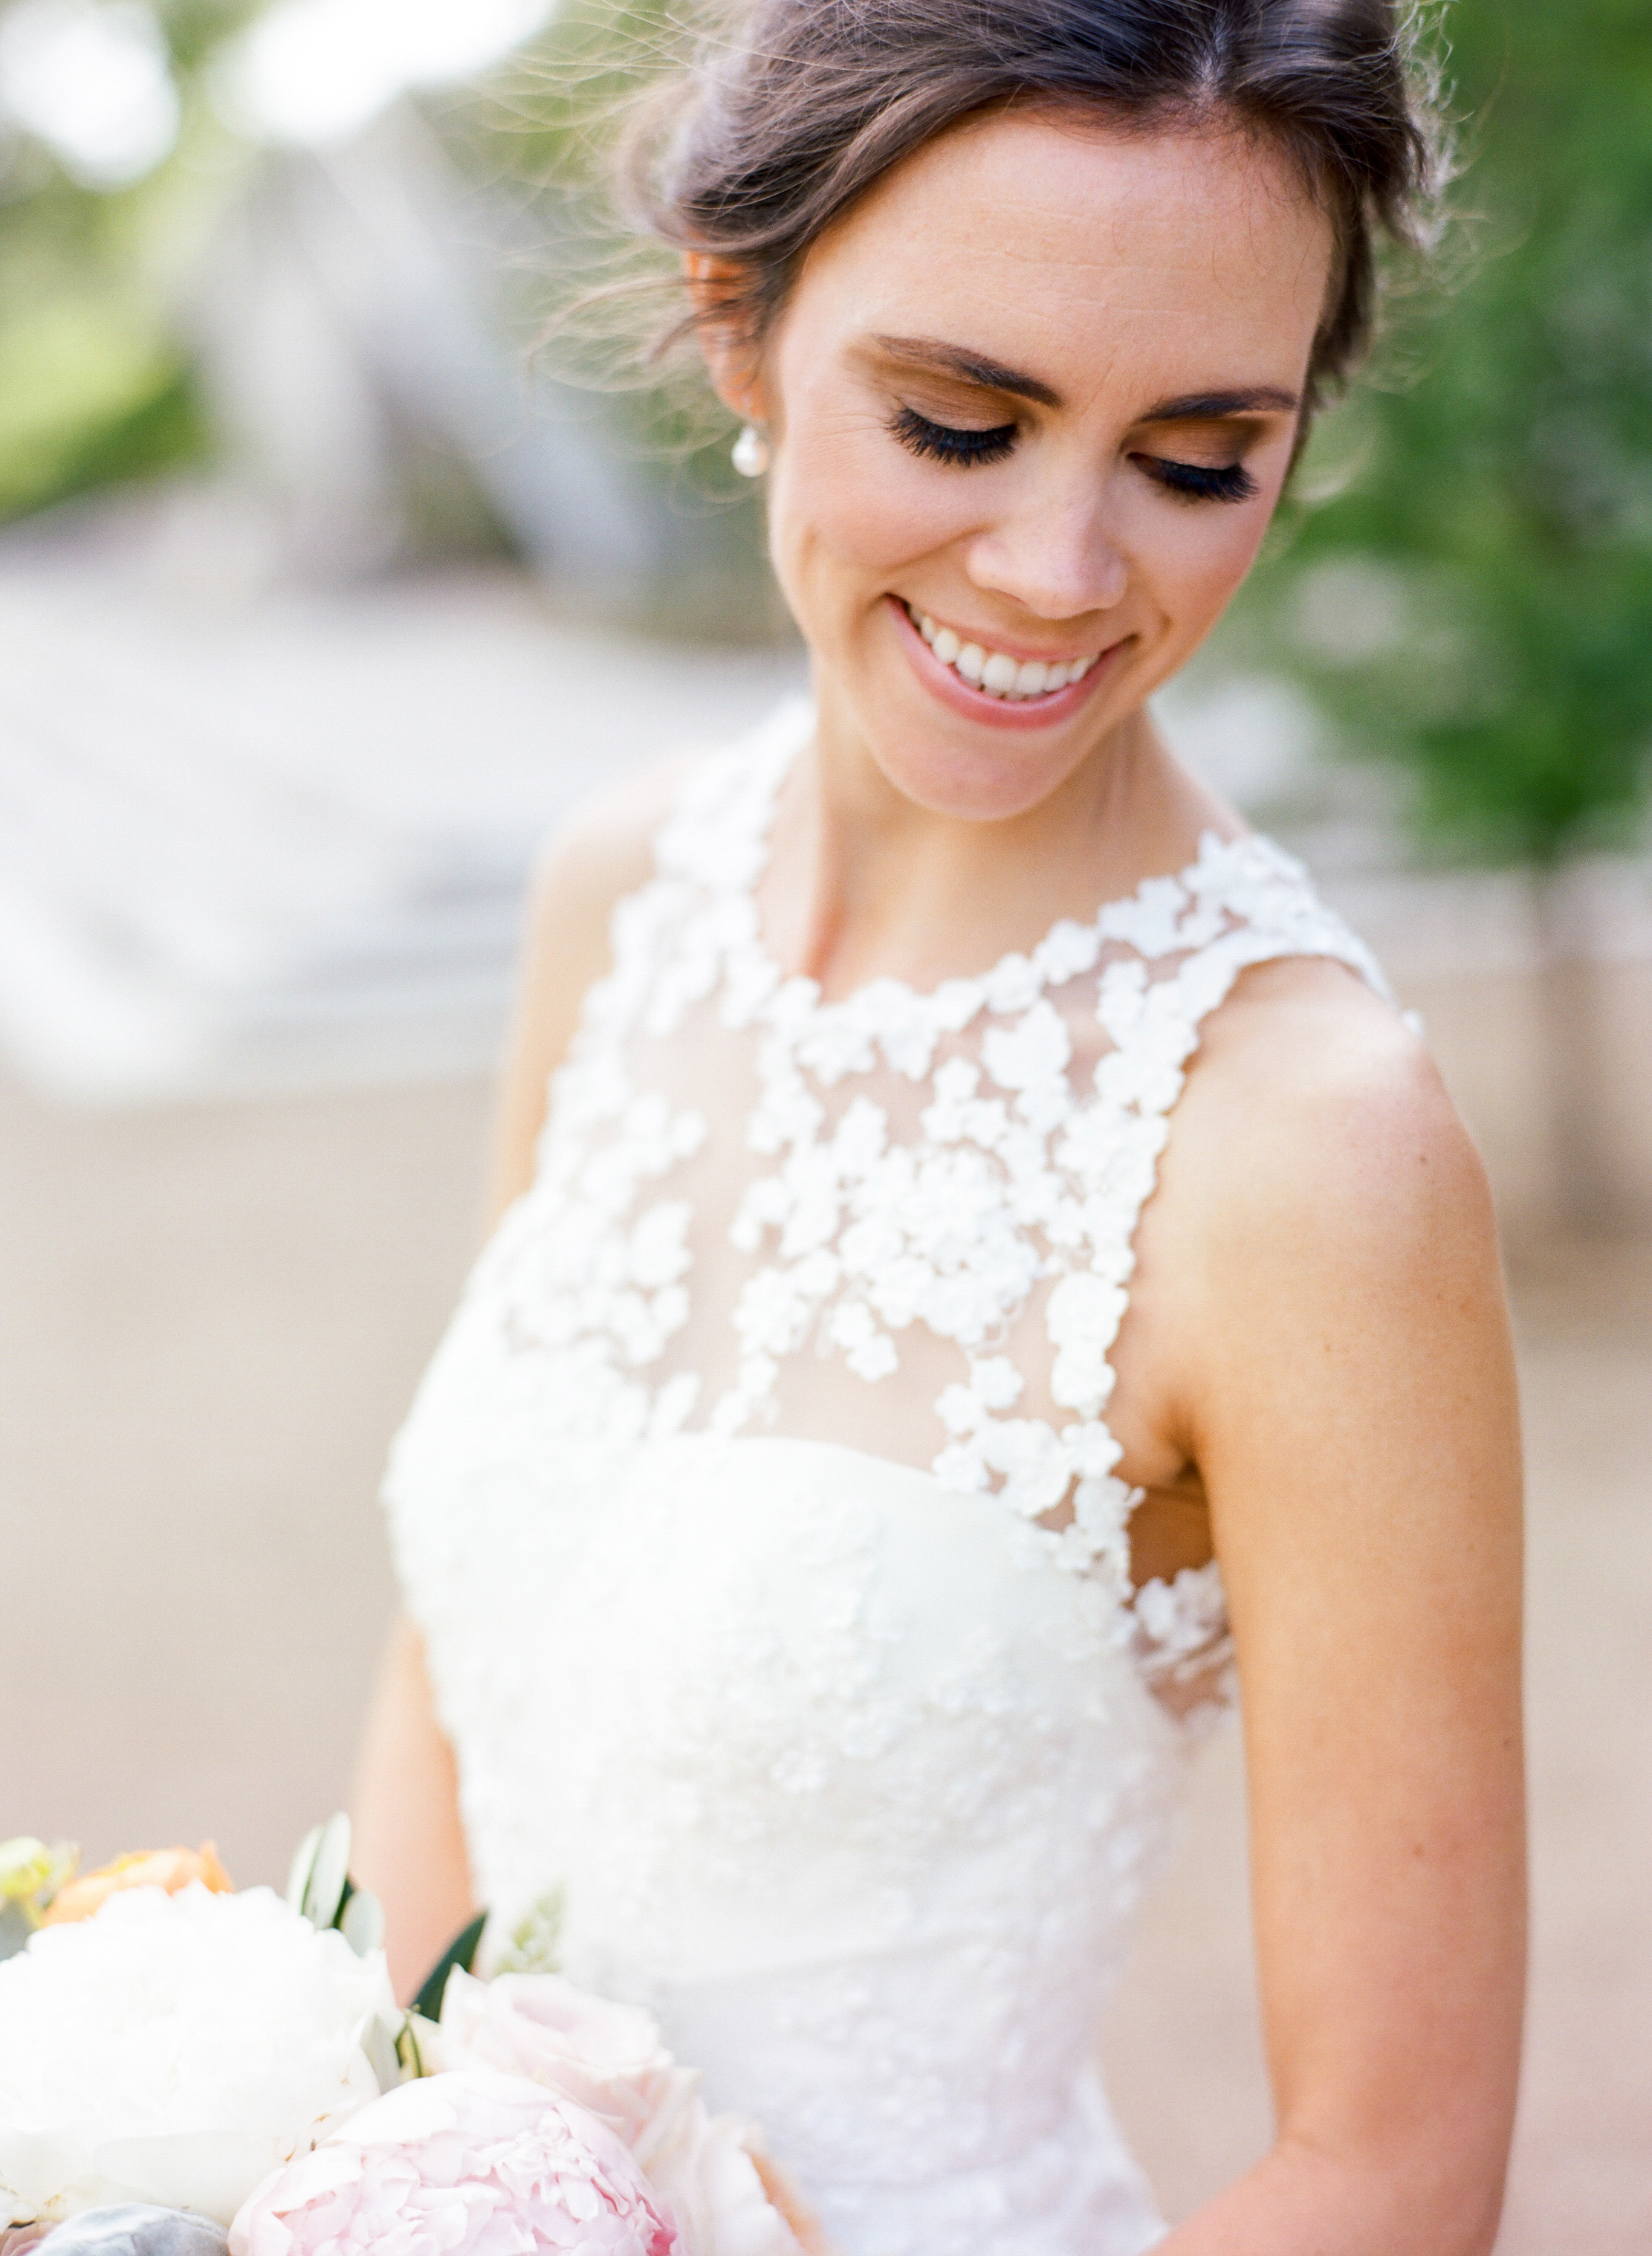 The-Dunlavy-Wedding-Photography-Bridals-Houston-Film-Dana-Fernandez-Photography-Potraits-4.jpg